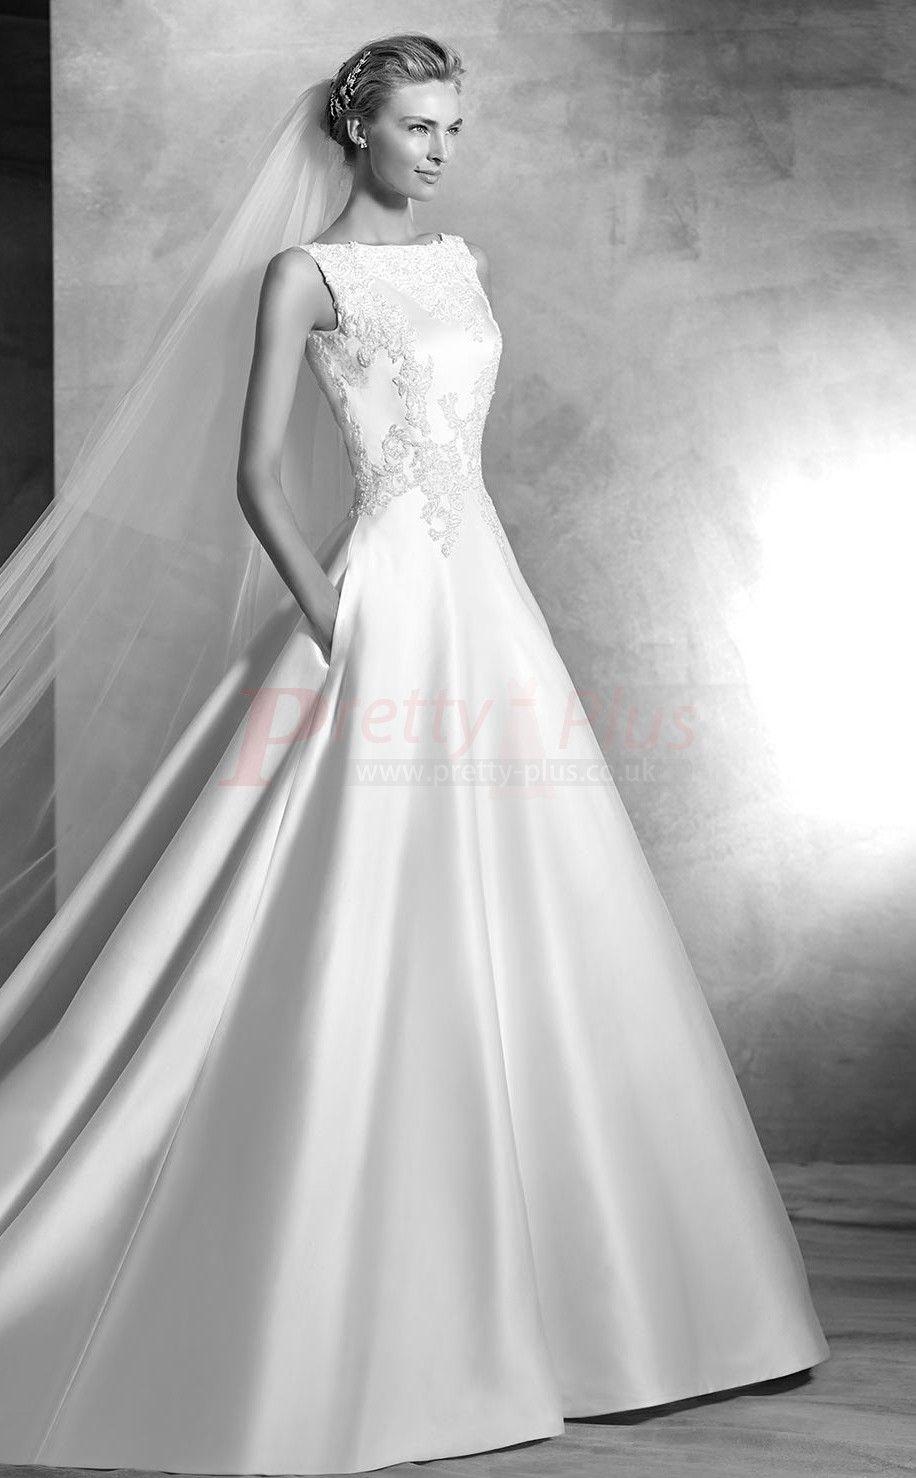 Boat Neck Low Back Wedding Dress